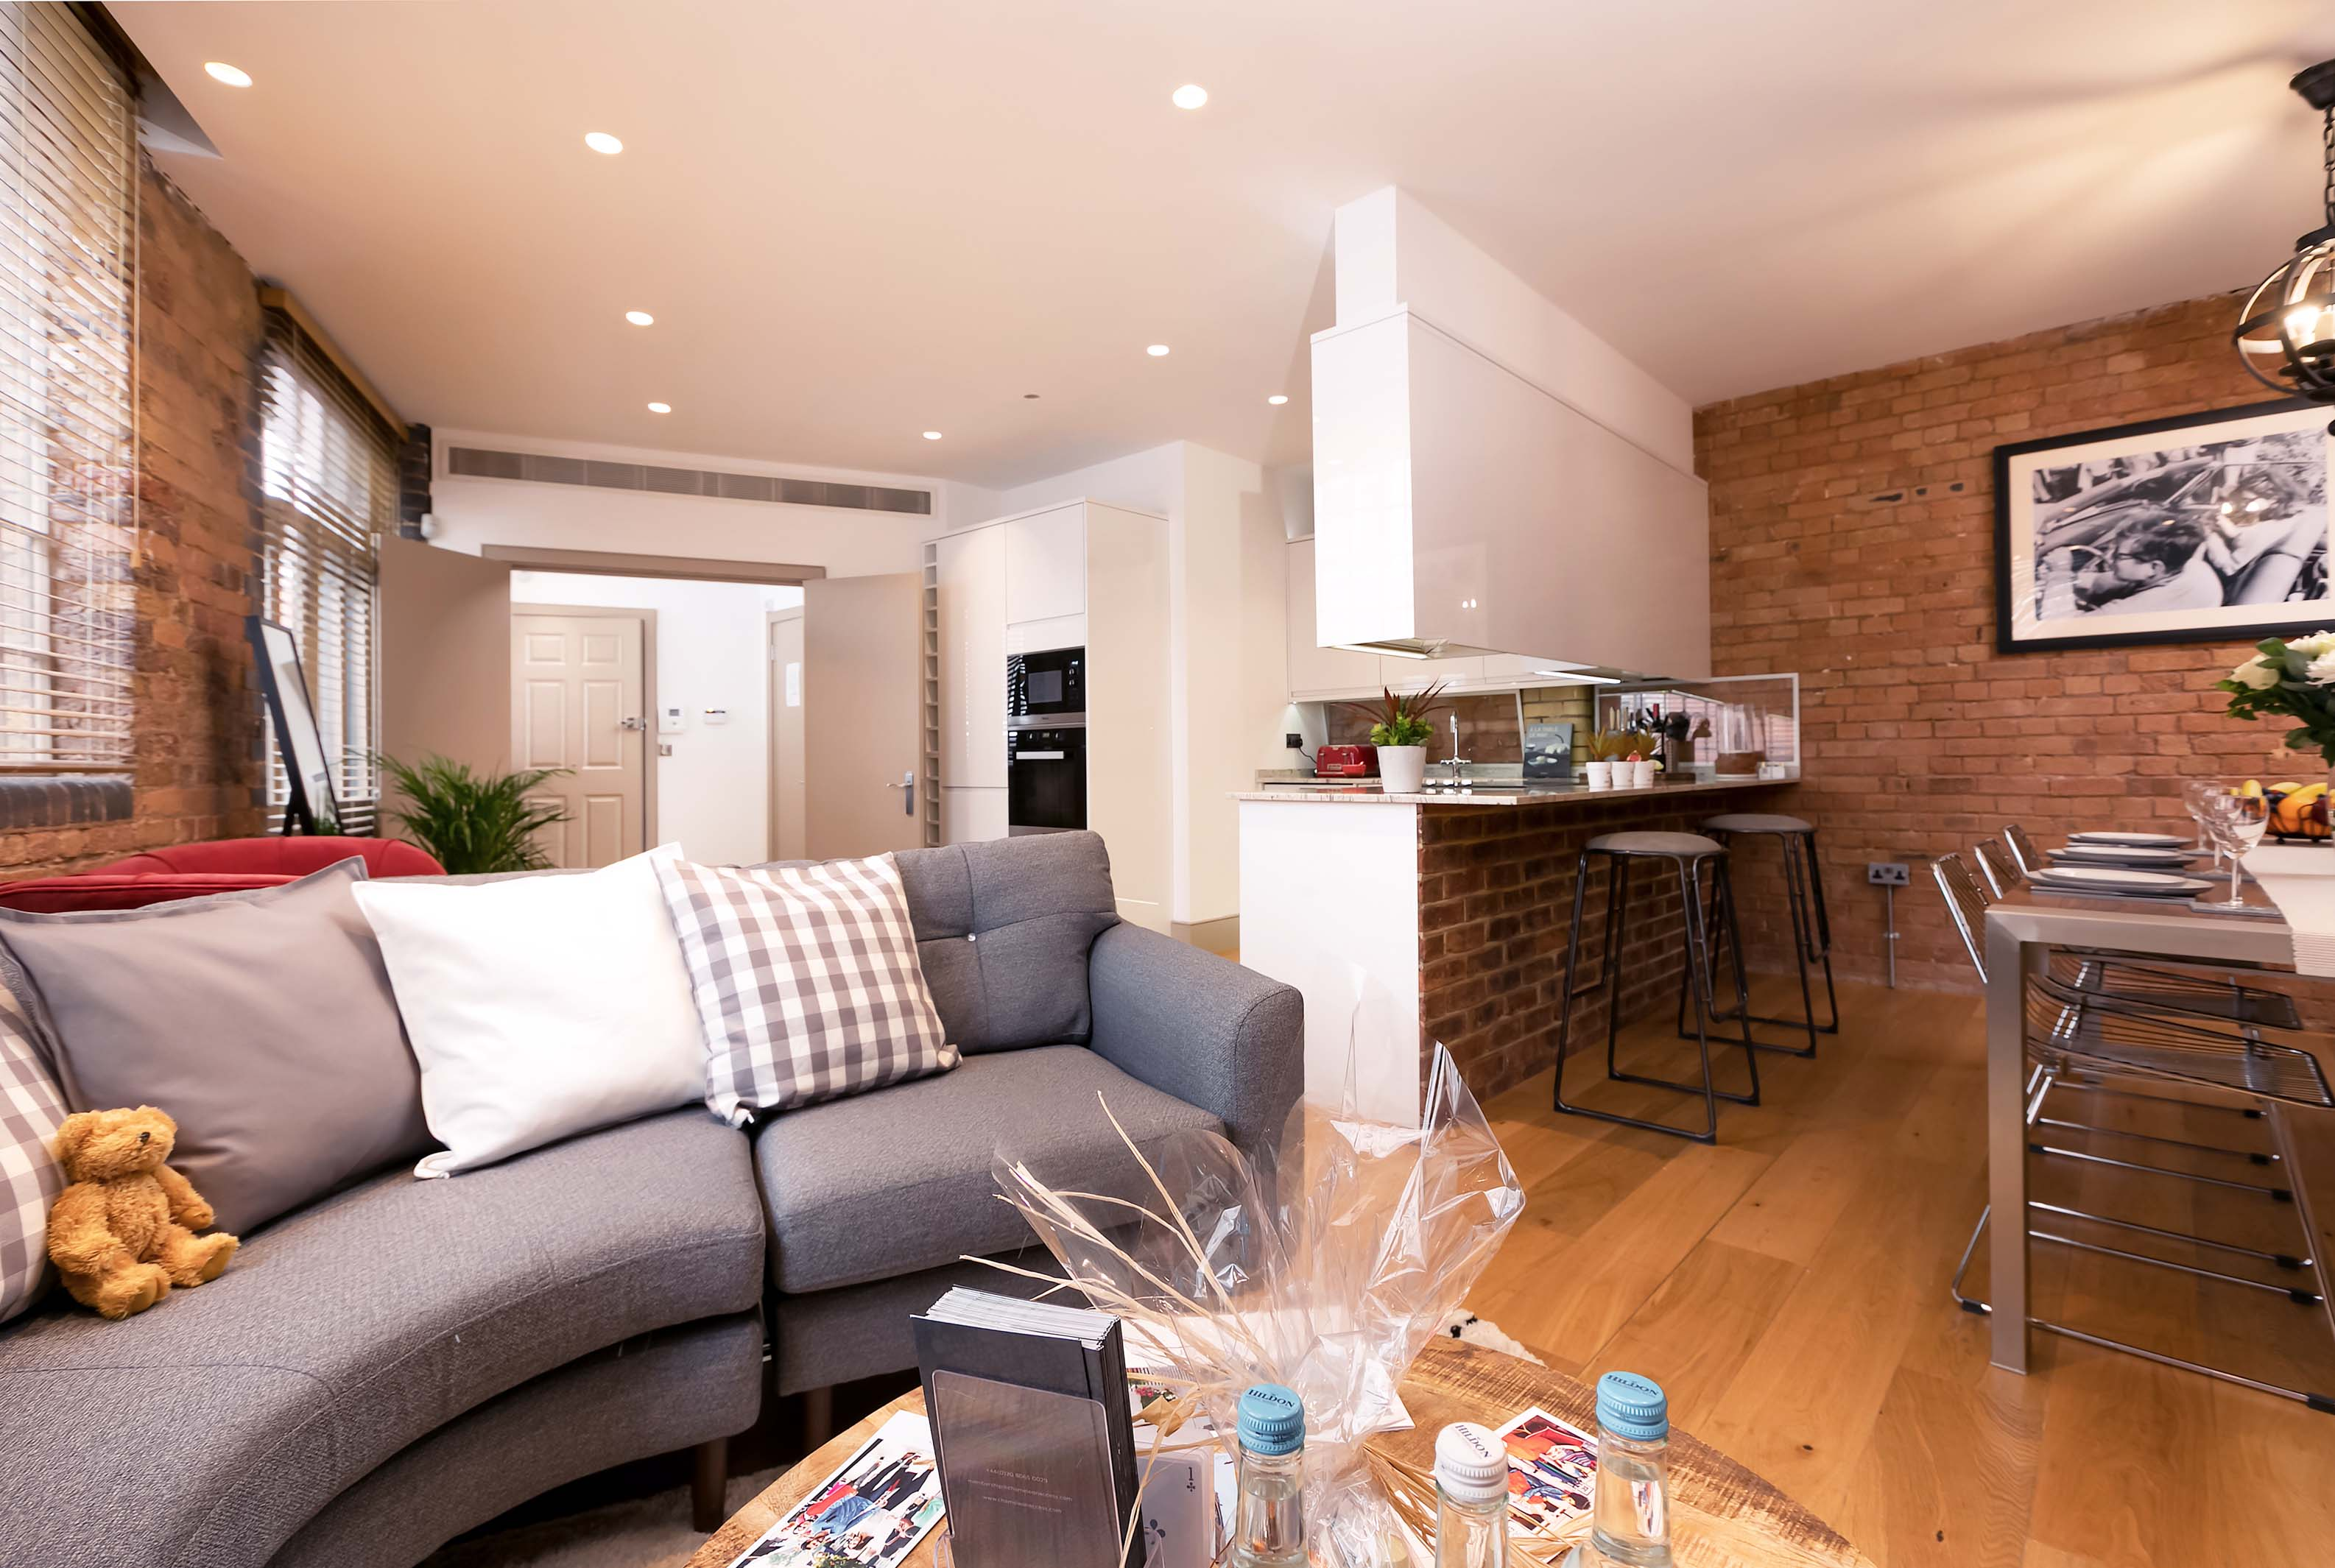 Lovelydays luxury service apartment rental - London - Fitzrovia - Wells Mews B - Lovelysuite - 2 bedrooms - 2 bathrooms - Luxury living room - 450c4cf91359 - Lovelydays